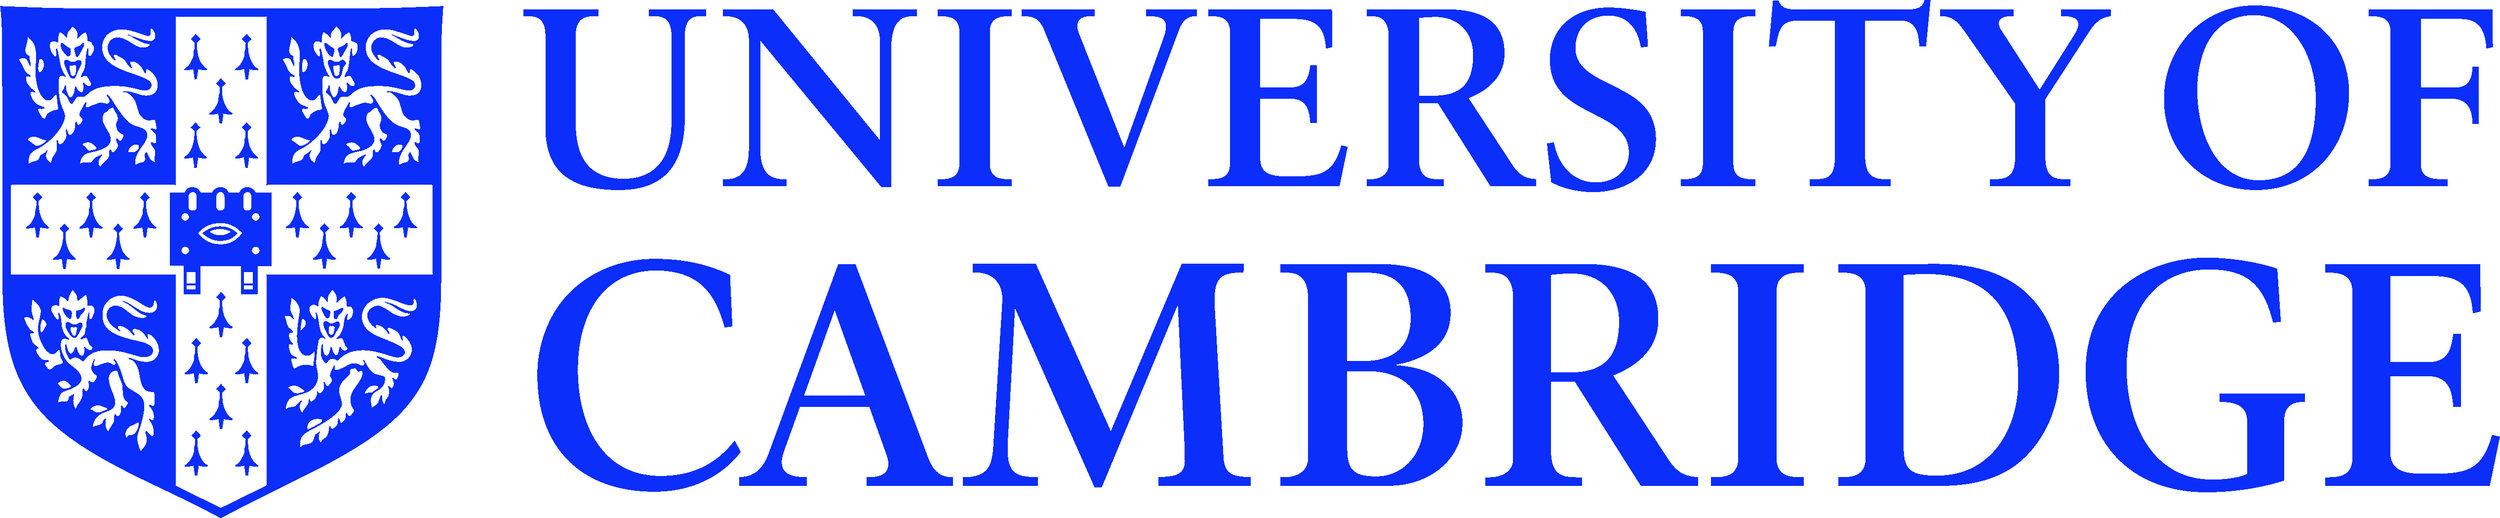 university-of-cambridge-logo-2.jpg